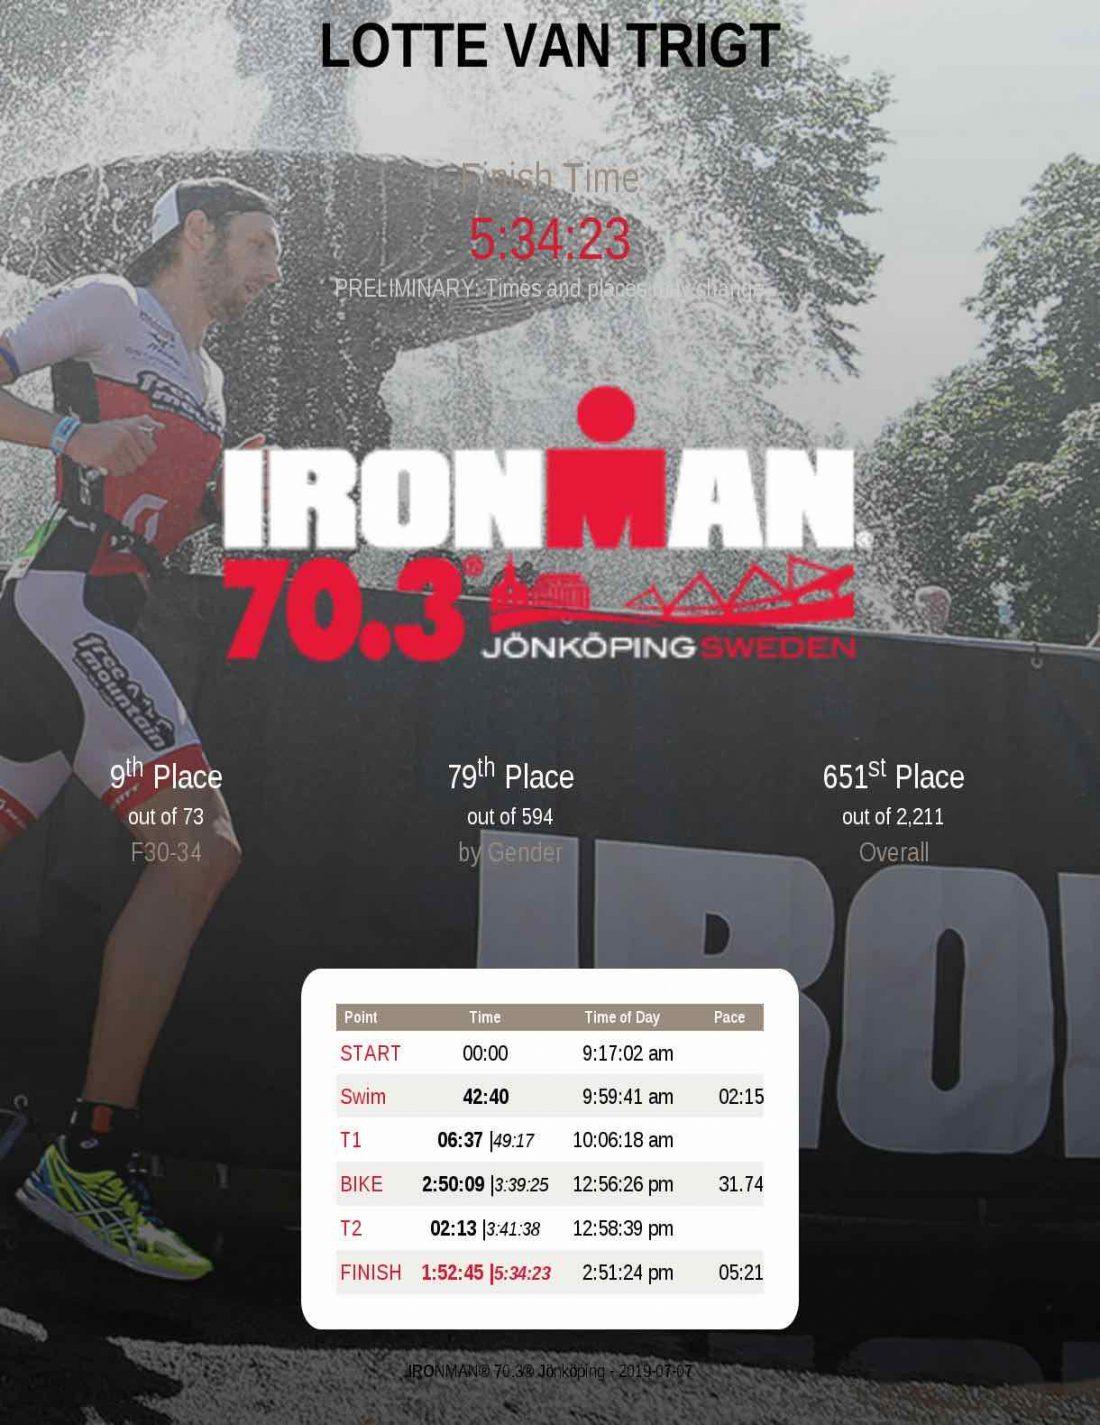 Halve-Ironman-did-it!Done-it!